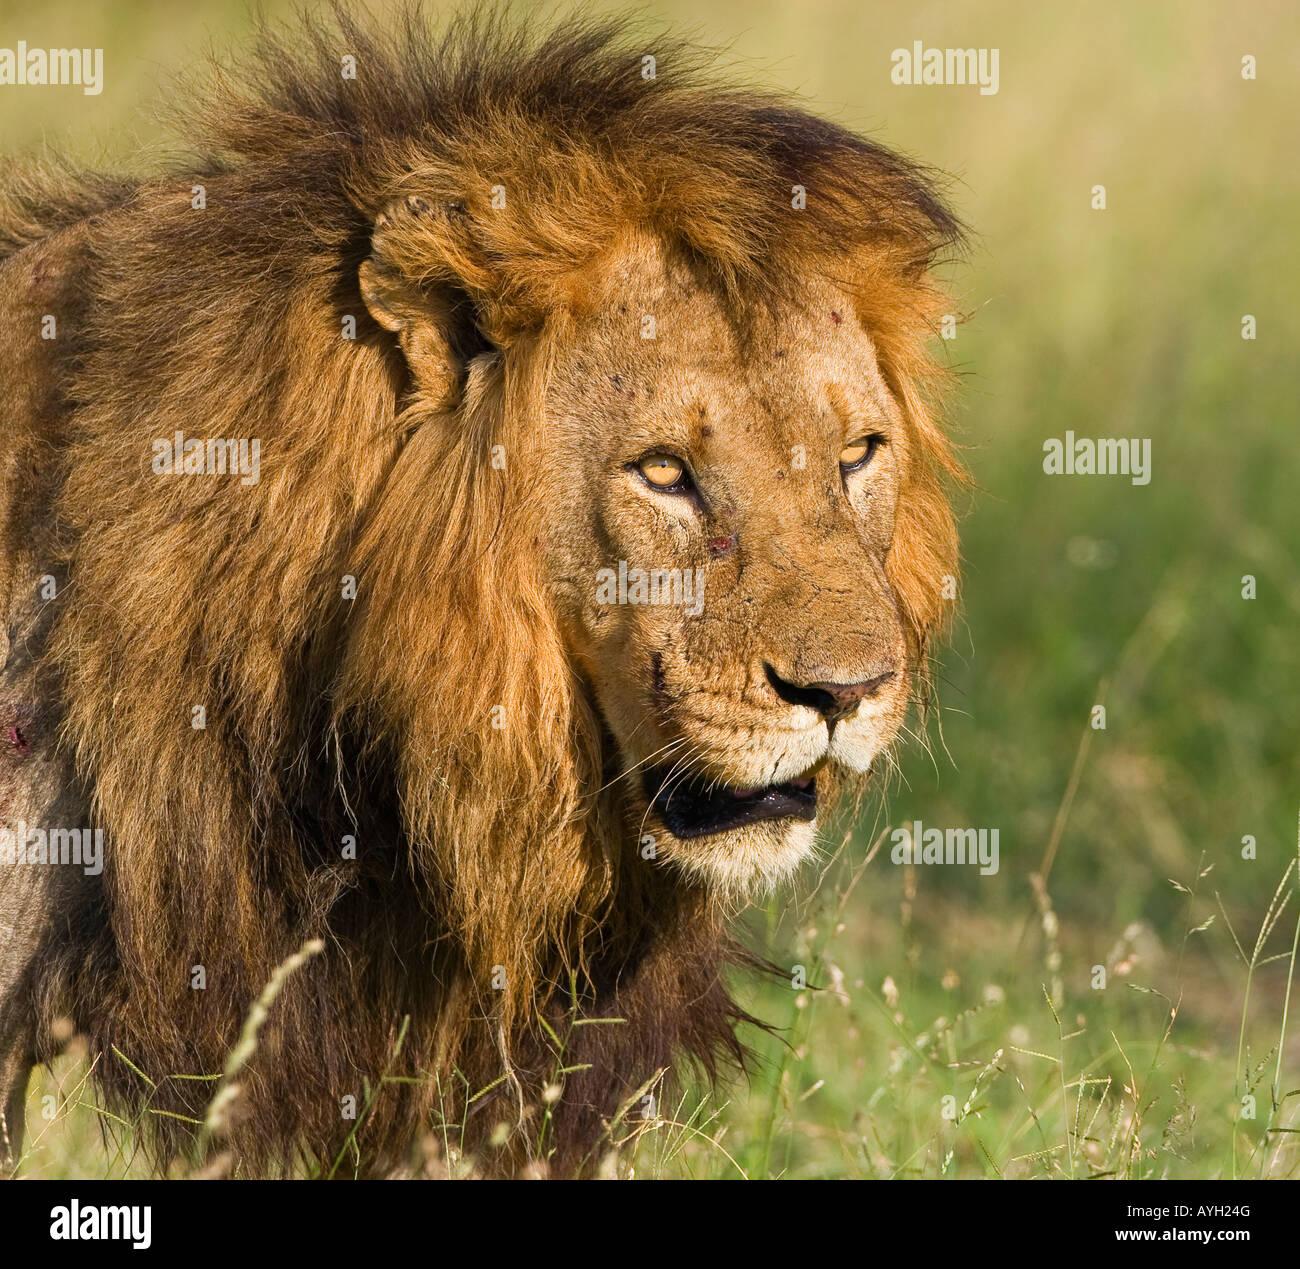 Cerca de león macho, mayor Parque Nacional Kruger, Sudáfrica Imagen De Stock